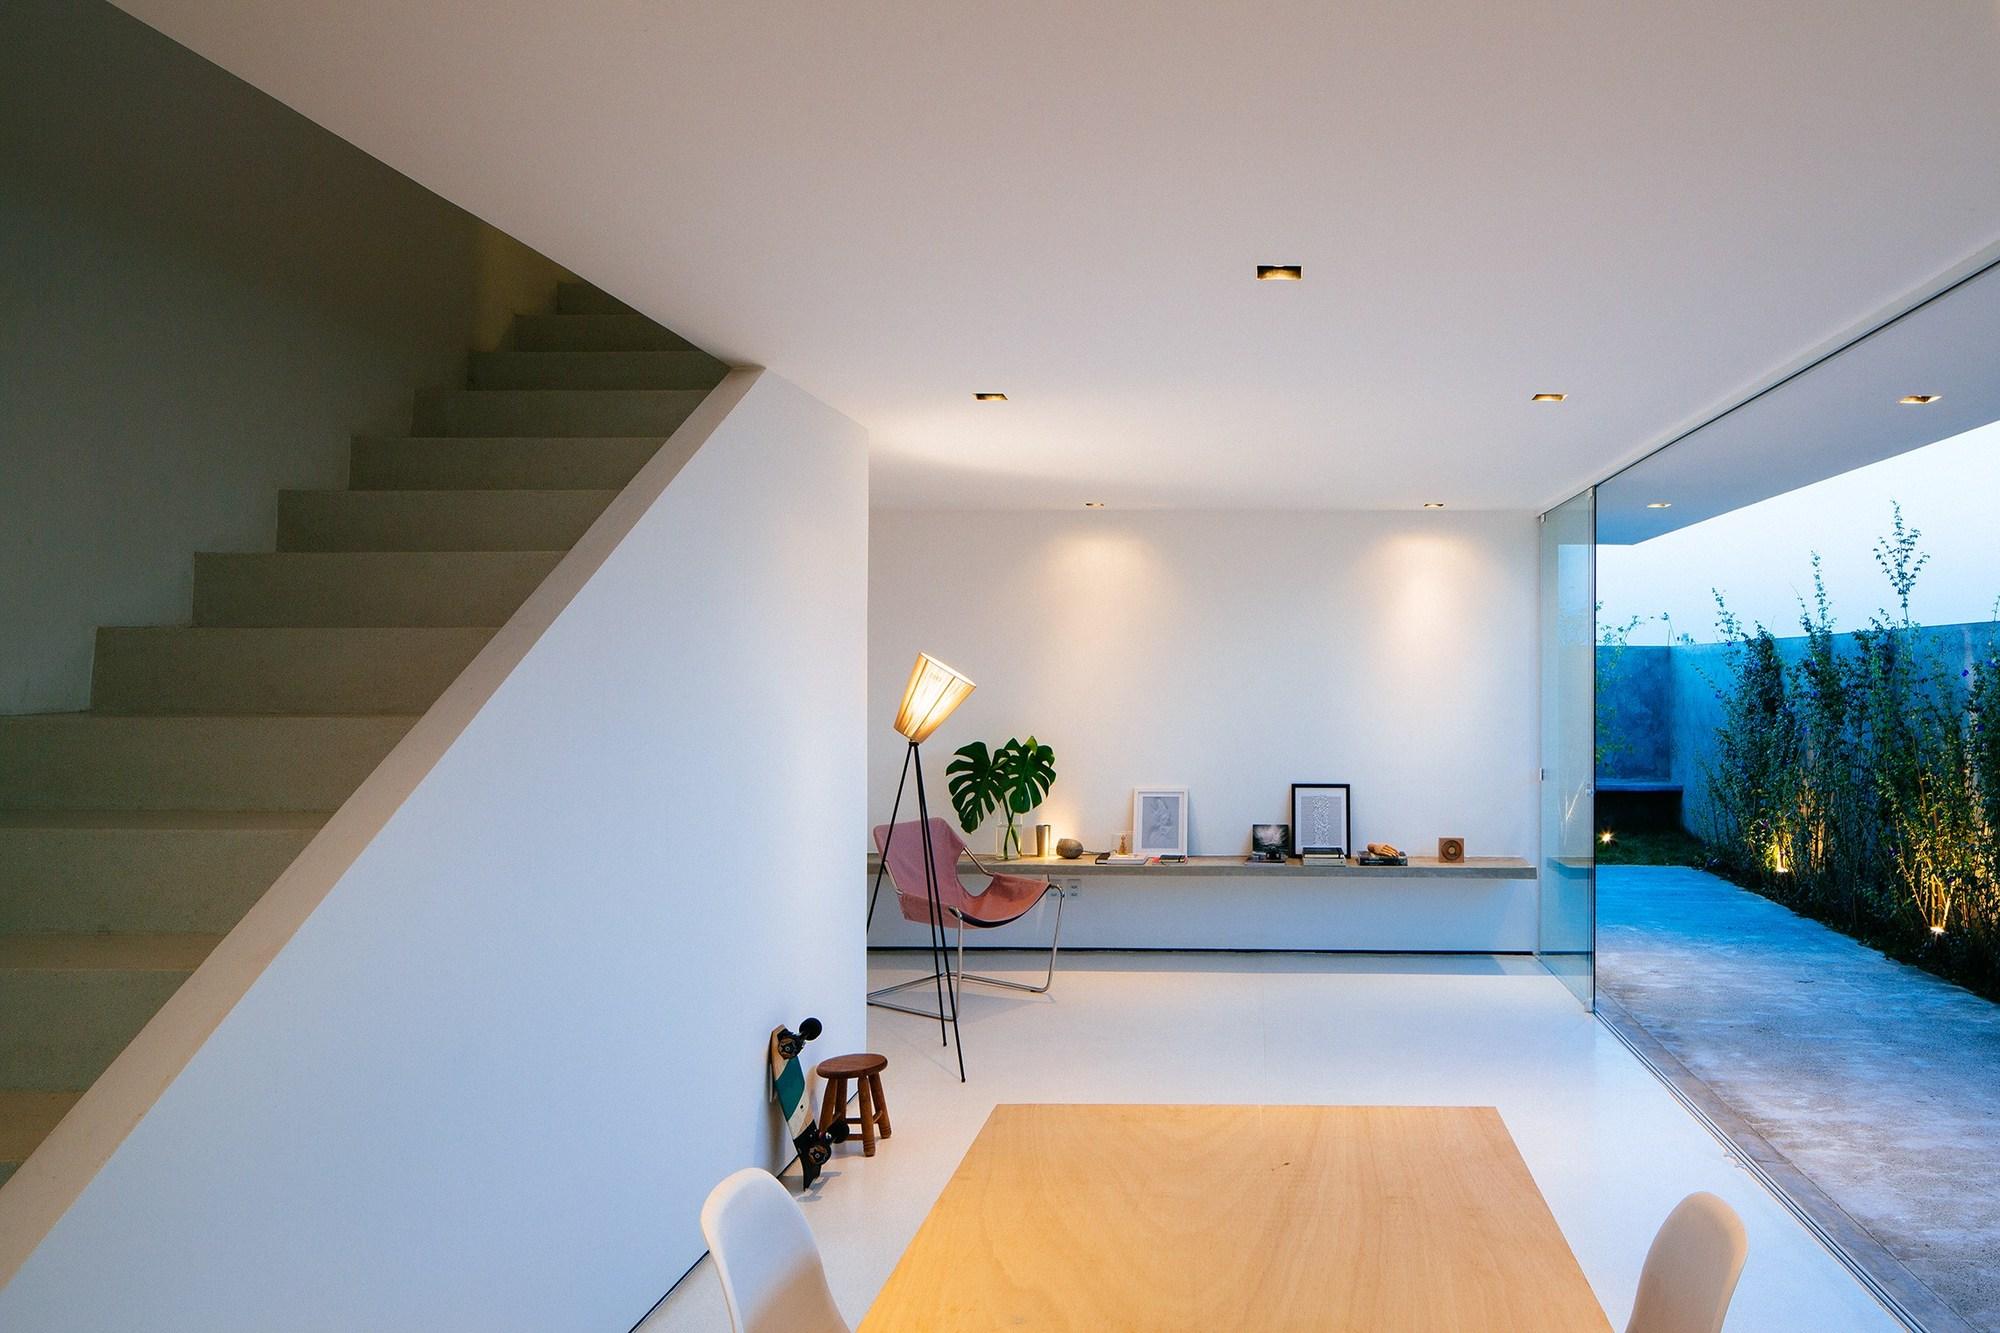 Gallery of sorocaba house estudio bra arquitetura 19 - Casas minimalistas por dentro ...